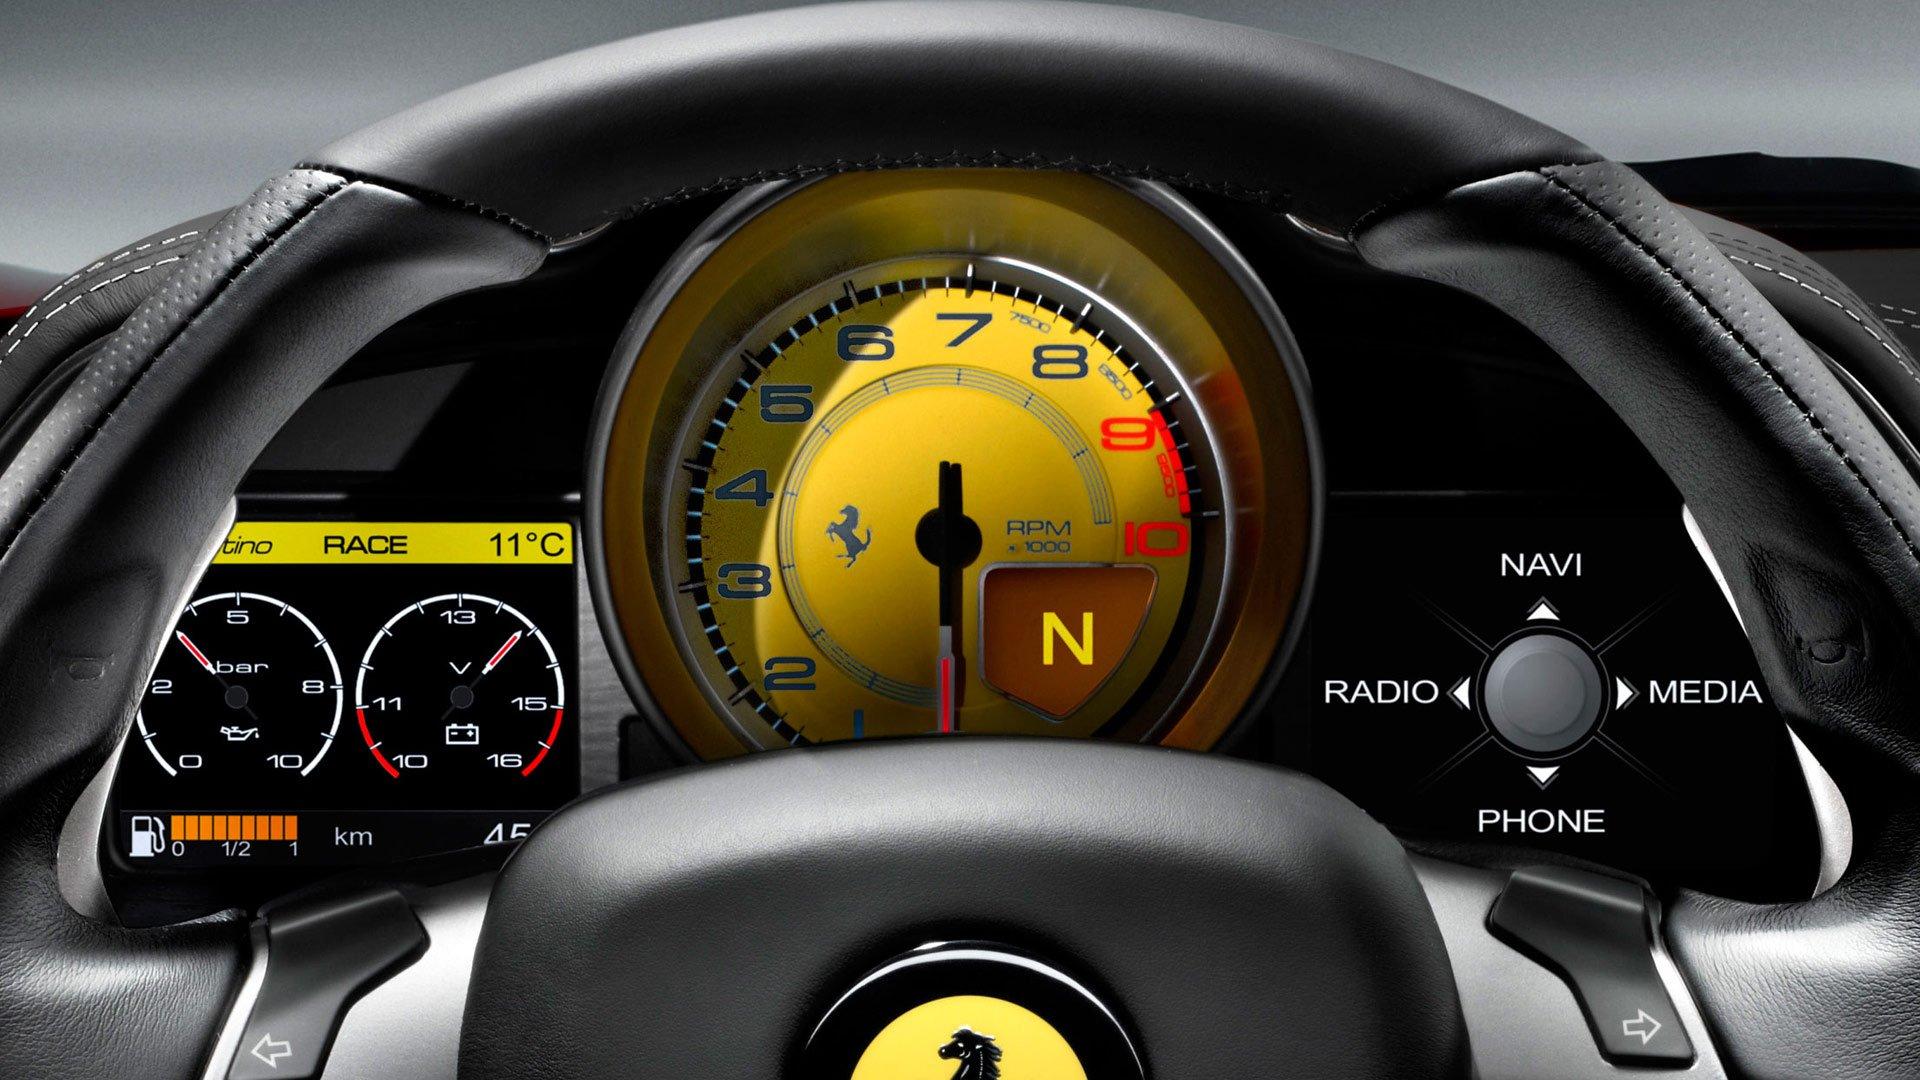 Ferrari Gauge Cluster For My Gt Ford Mustang Forum